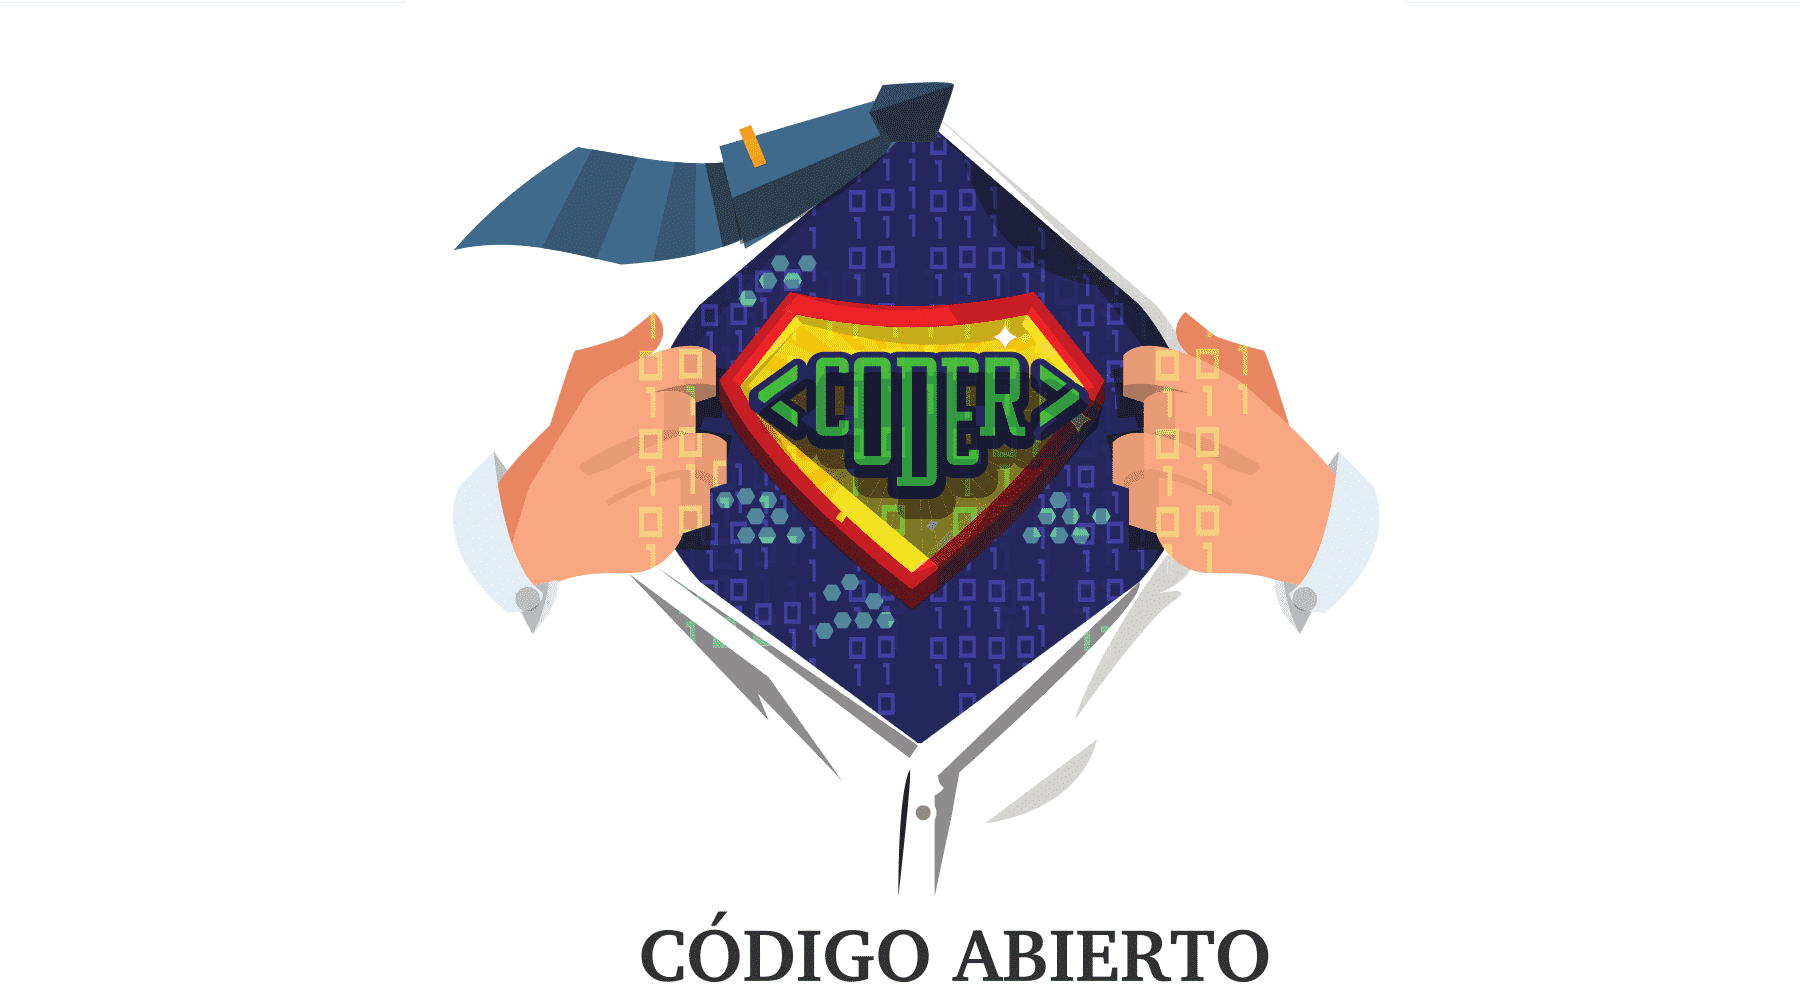 codigoabierto